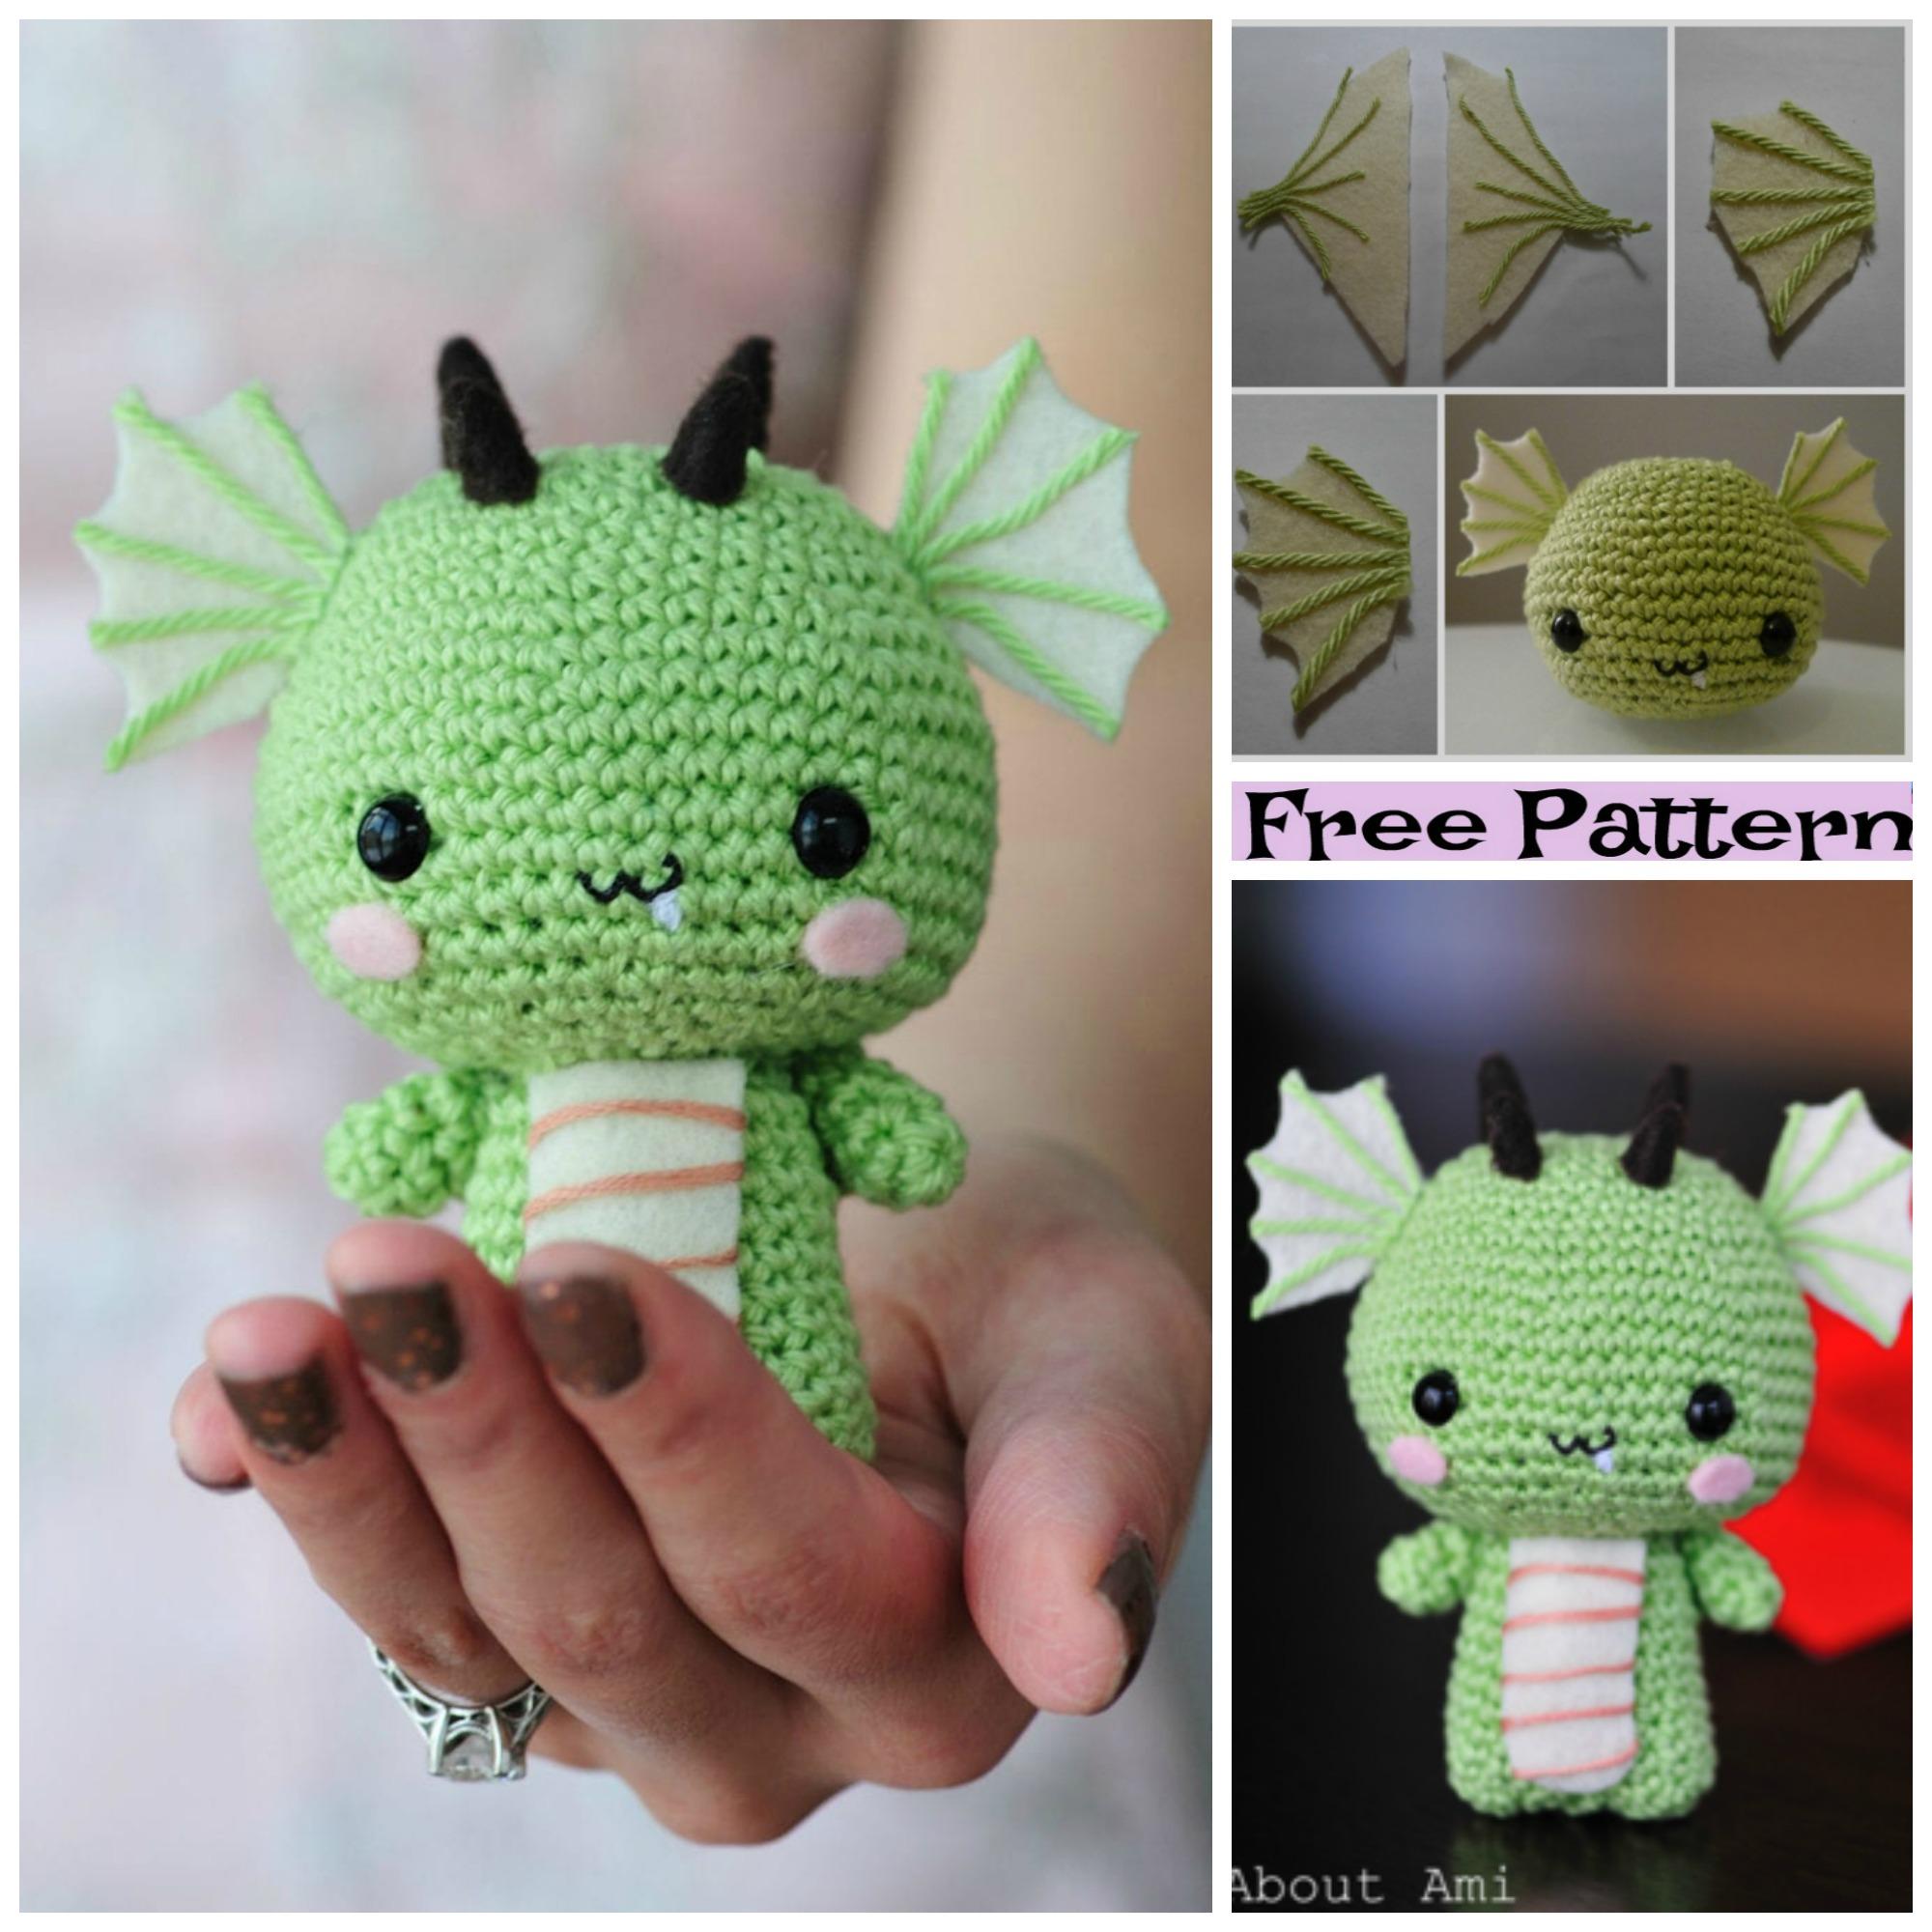 diy4ever-Crochet Dragon Amigurumi - Free Pattern